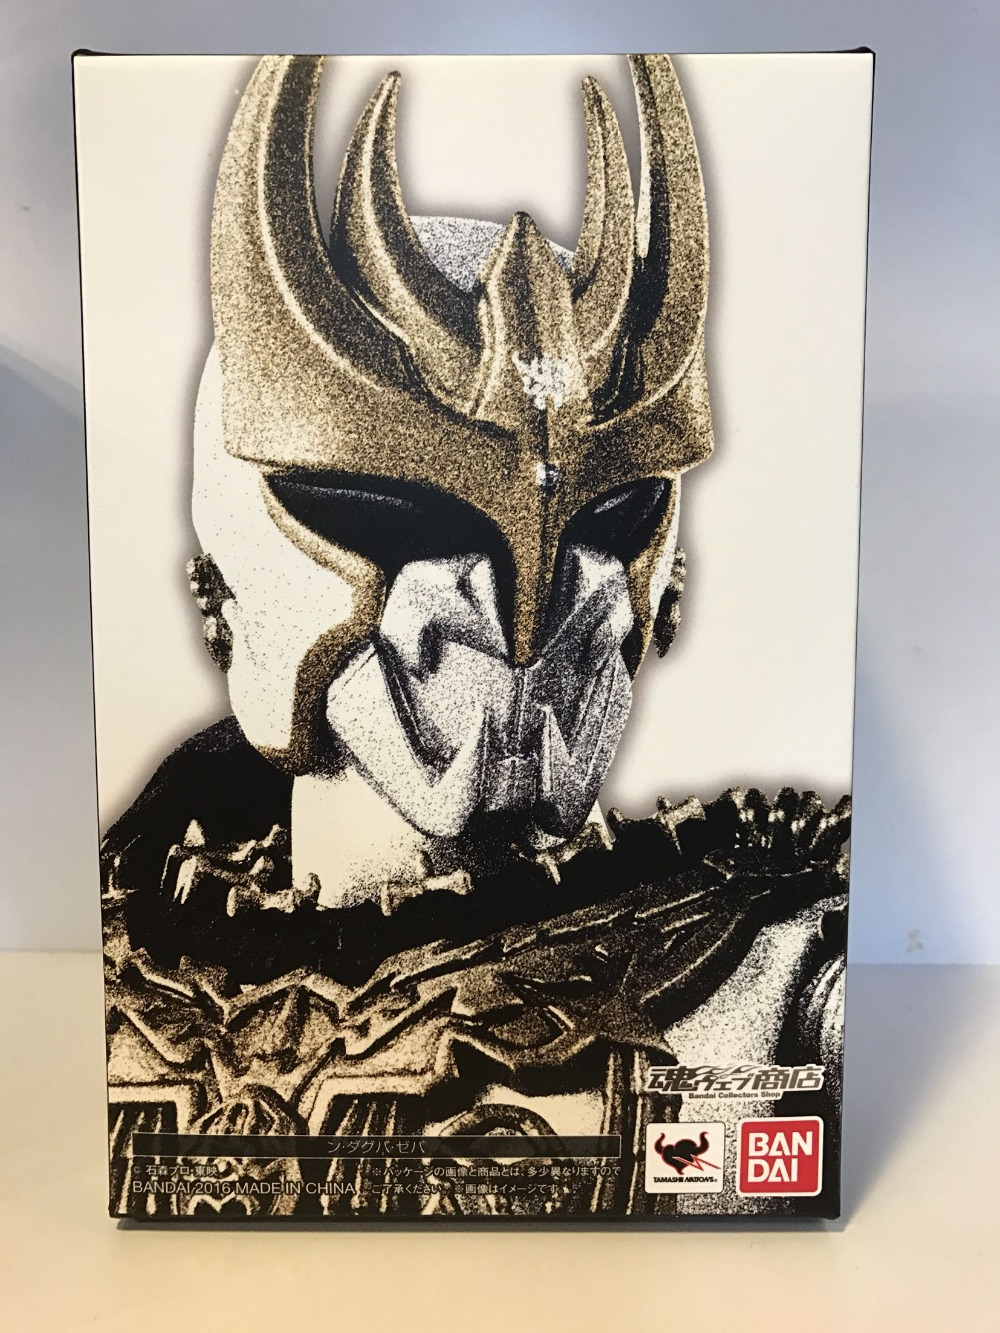 Brettyangel-véritable Bandai Tamashii Nations S. H. Figuarts cavalier masqué exclusif Kuuga N. Daguva. Zeba figurine d'action - 6